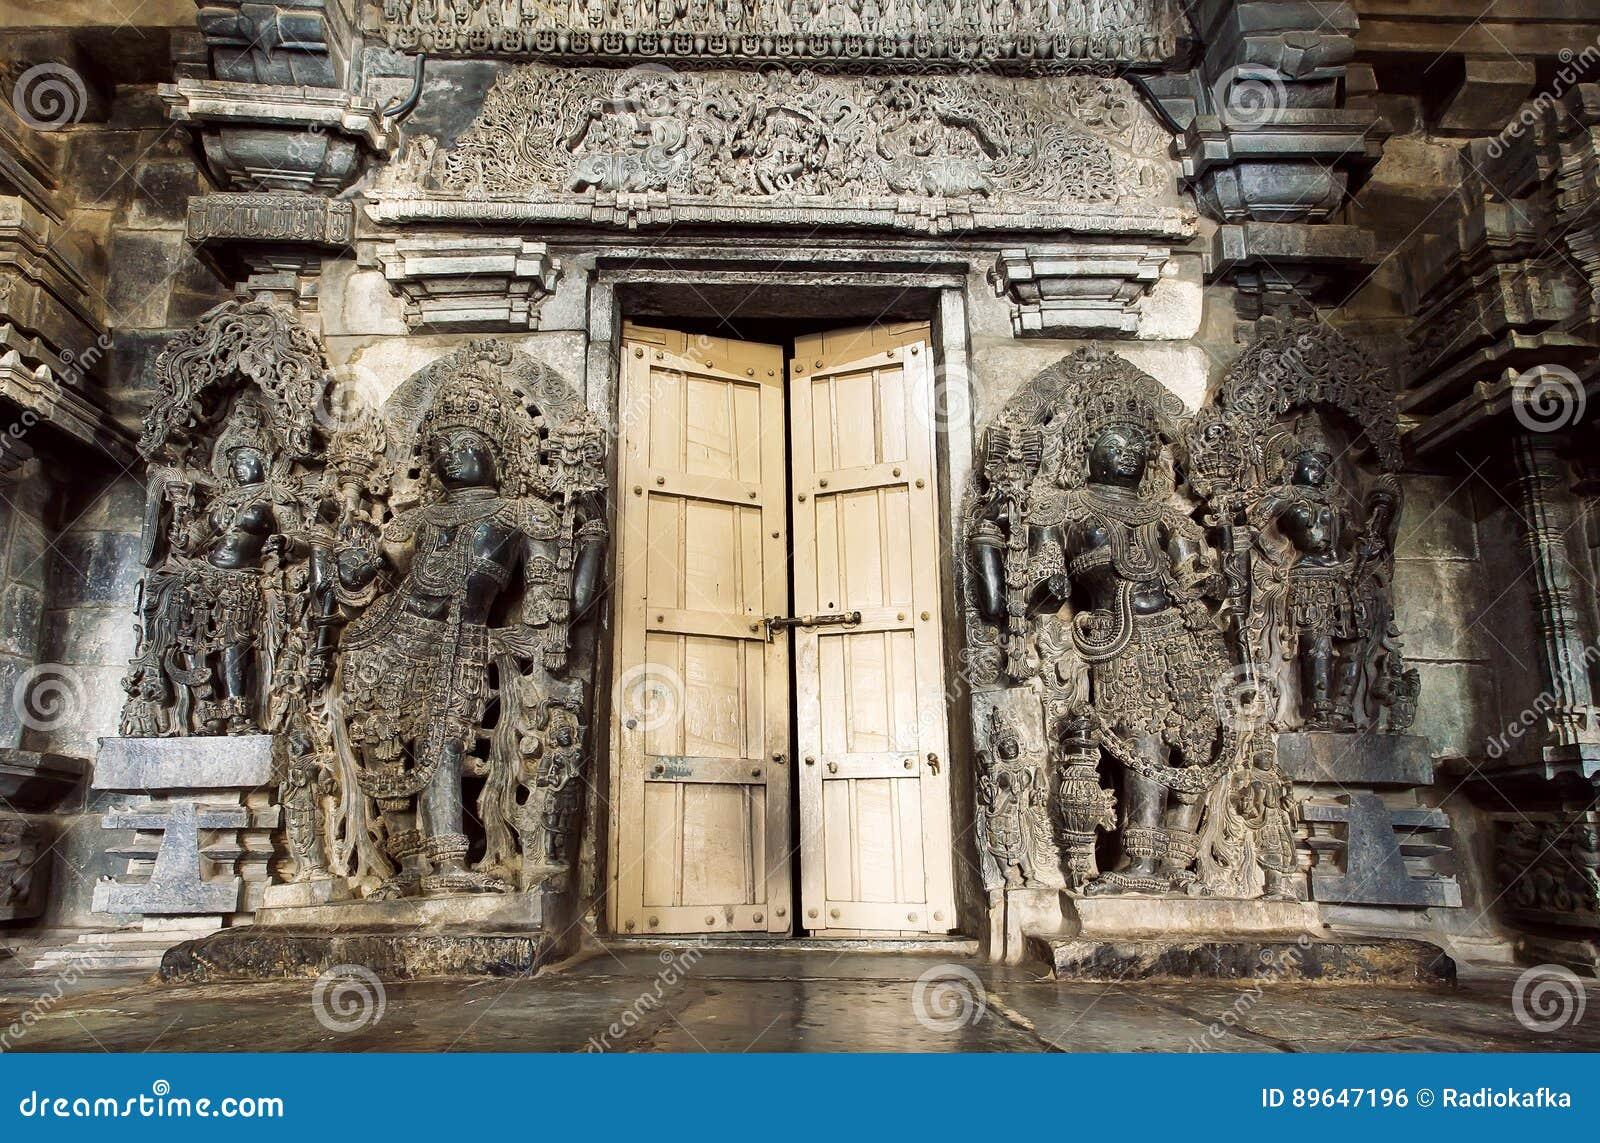 Os deuses hindu na porta de entrada ao estilo tradicional apedrejam o templo de Hoysaleswara, estrutura do século XII, Índia